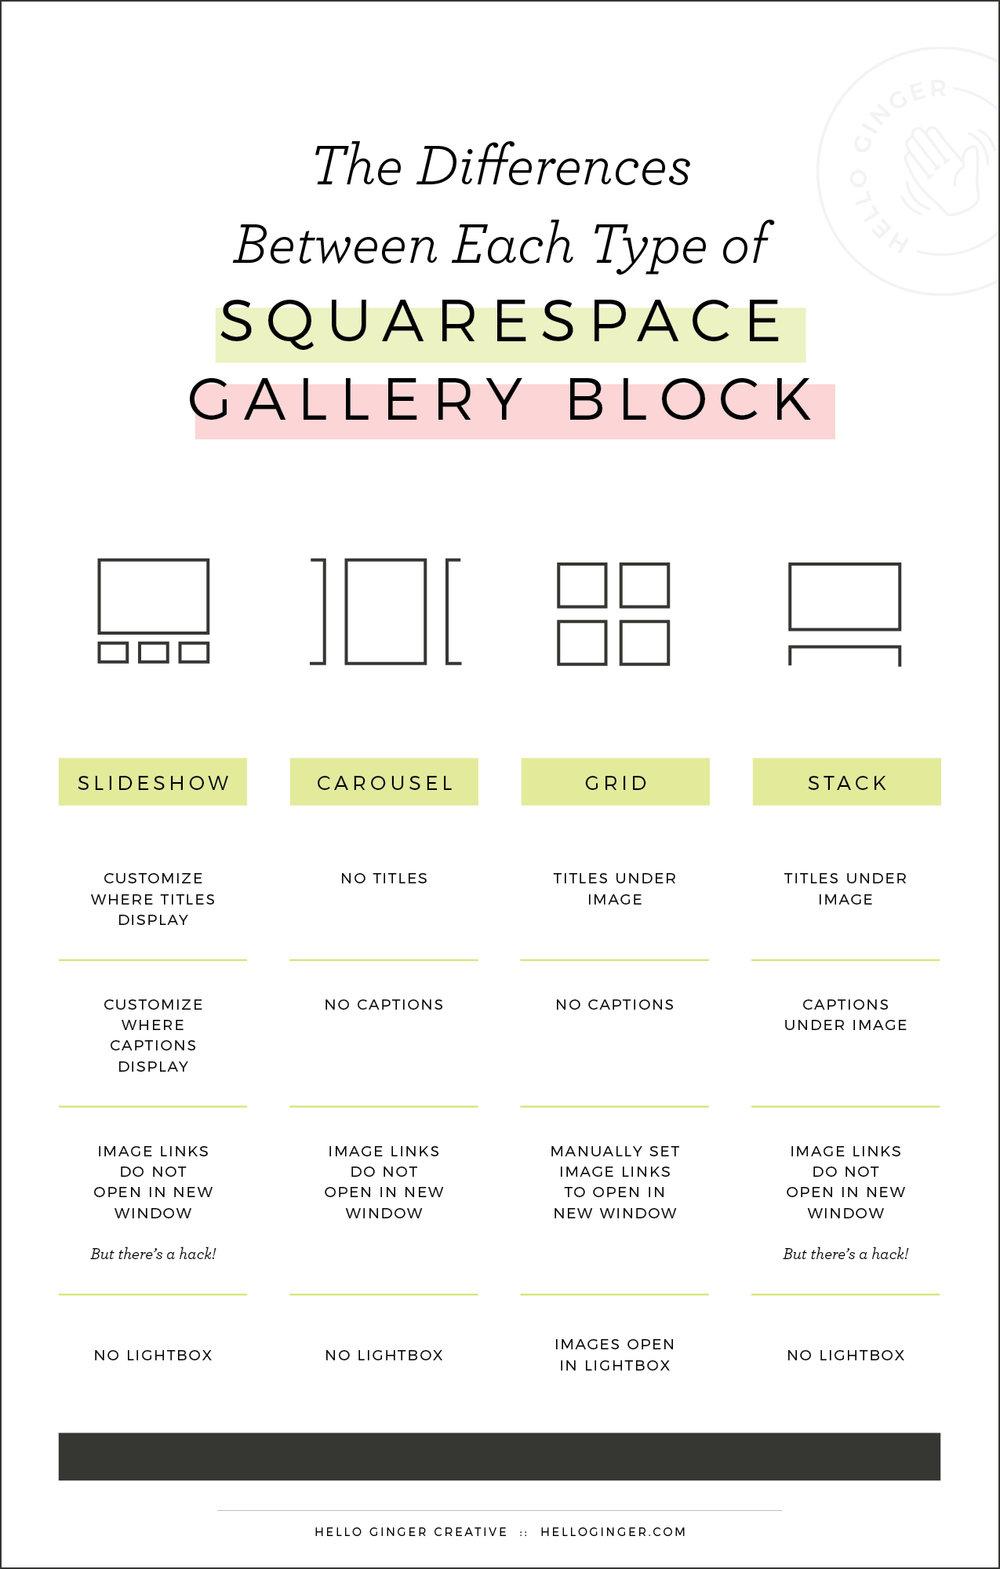 SquarespaceGalleryBlock_ComparisonChart.jpg